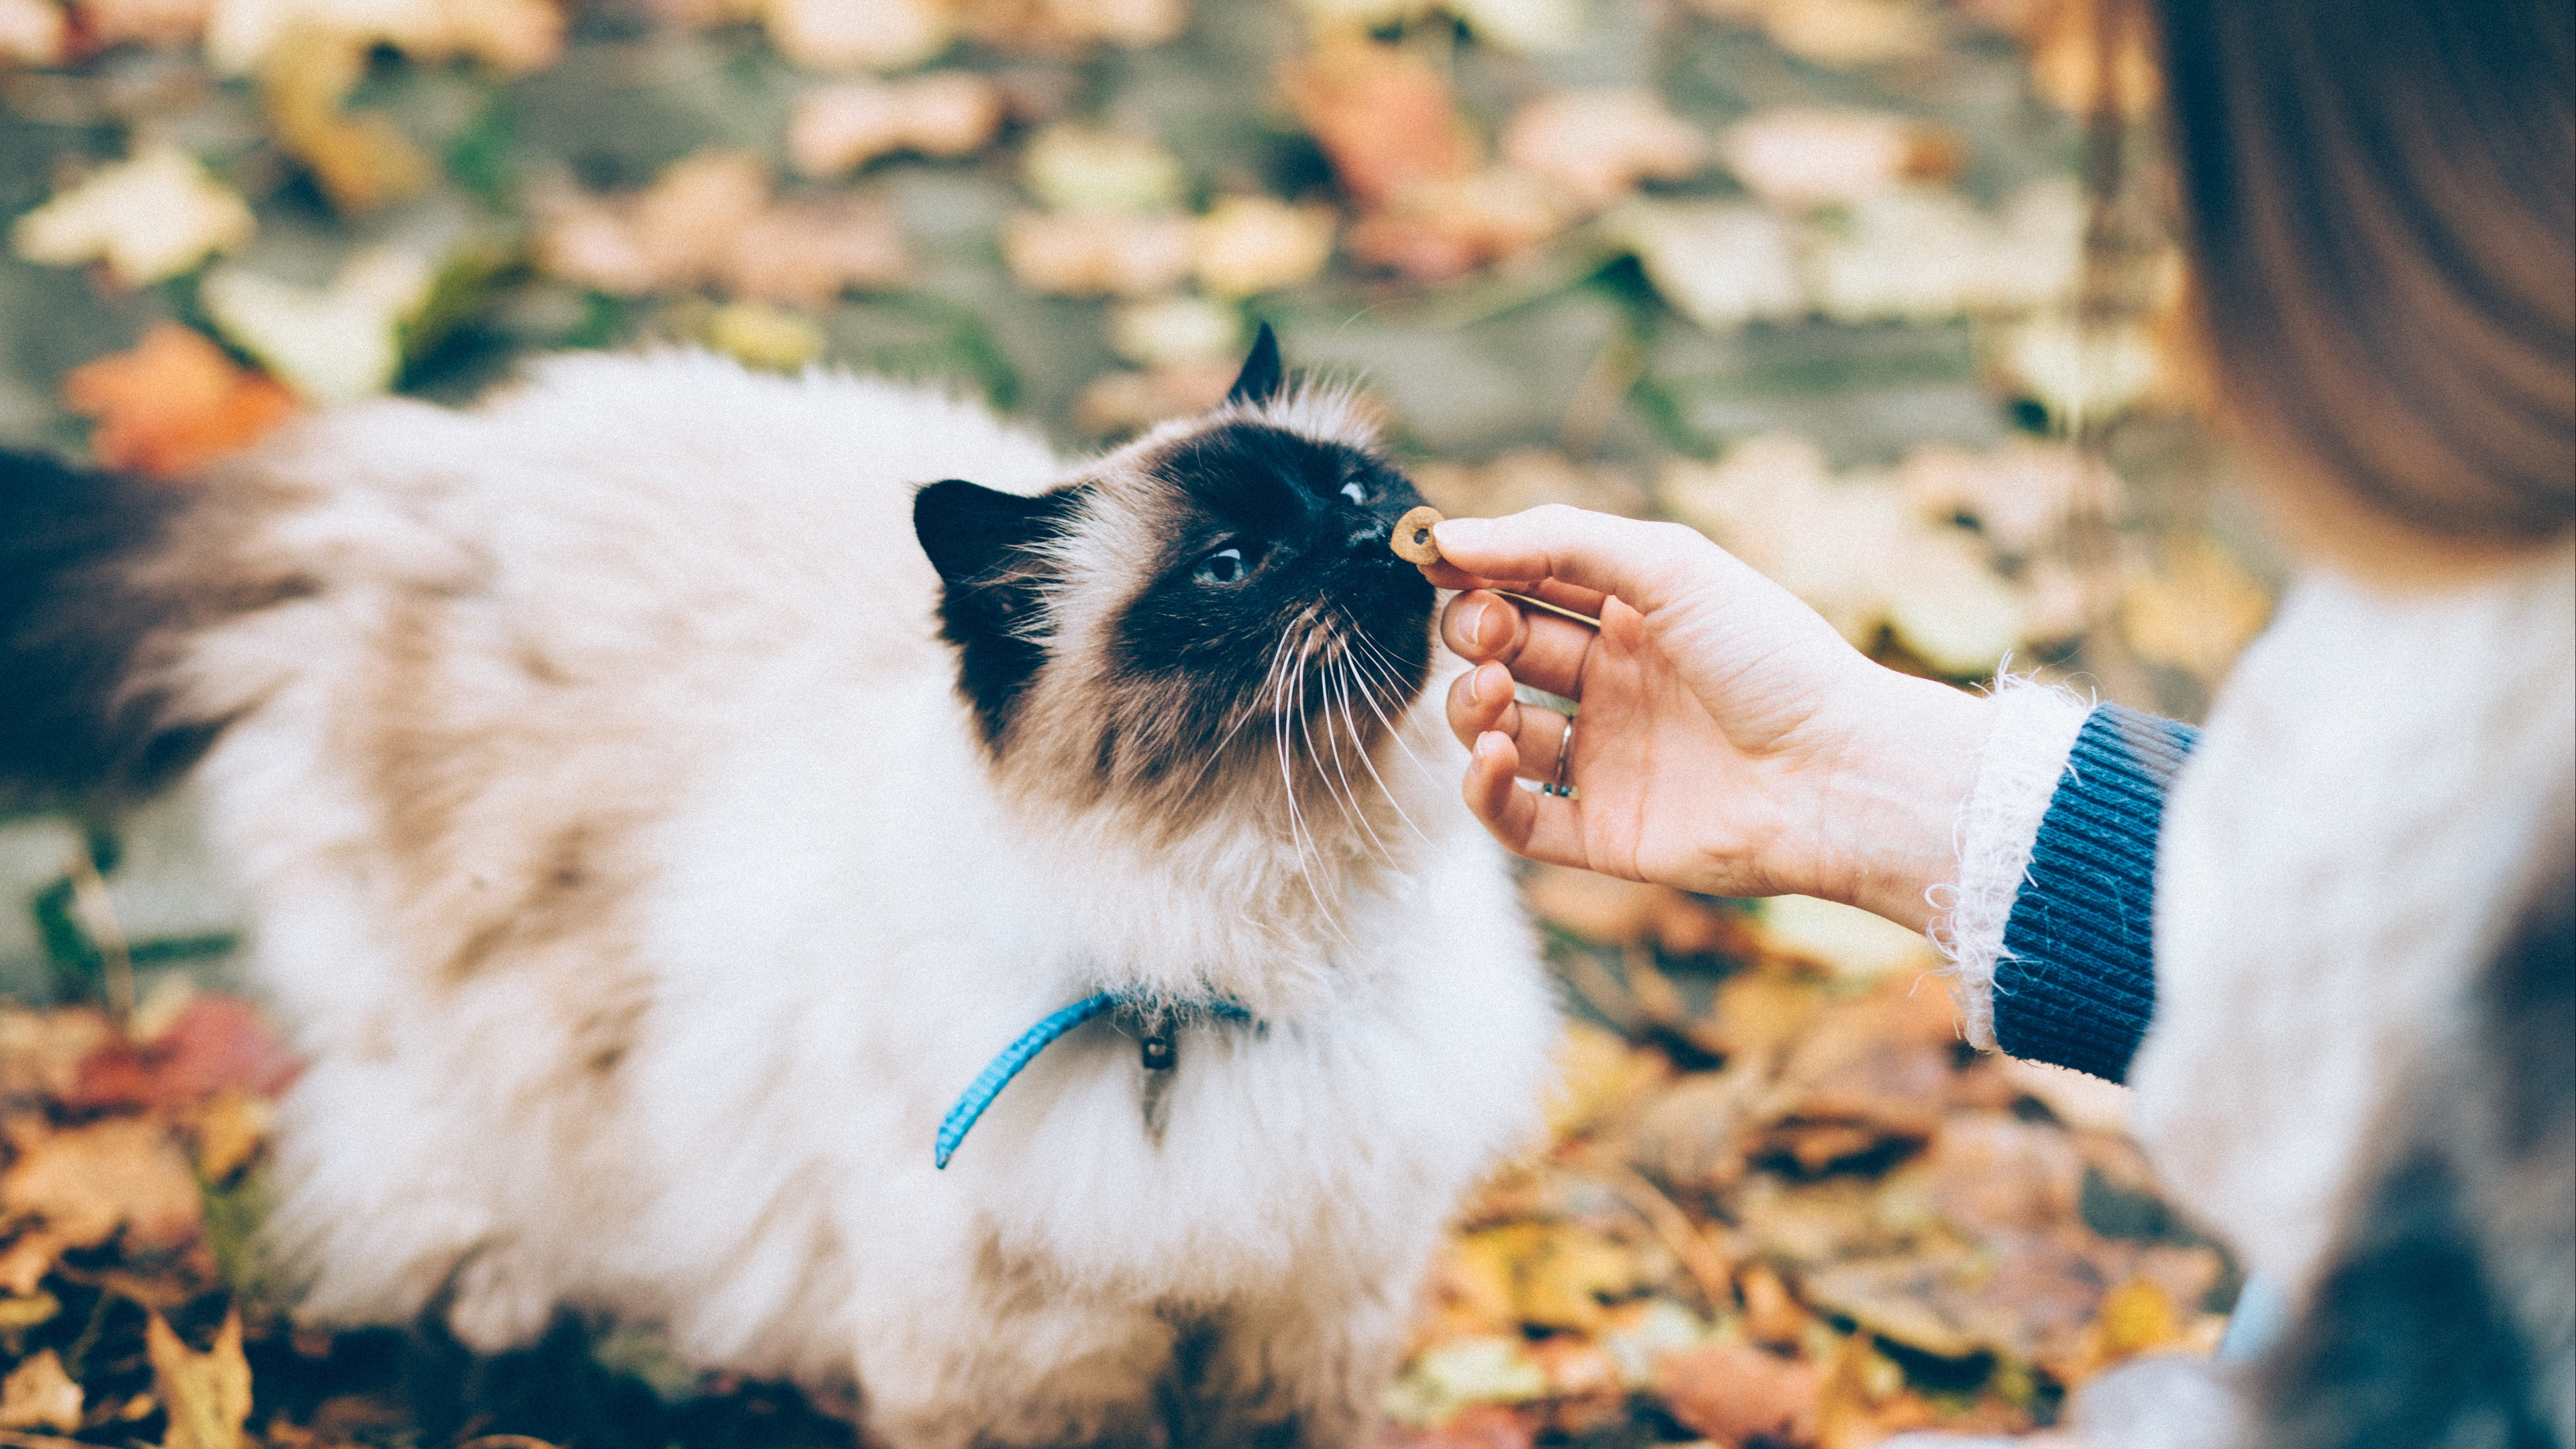 cat fluffy hand care 4k 1542242046 - cat, fluffy, hand, care 4k - hand, fluffy, Cat